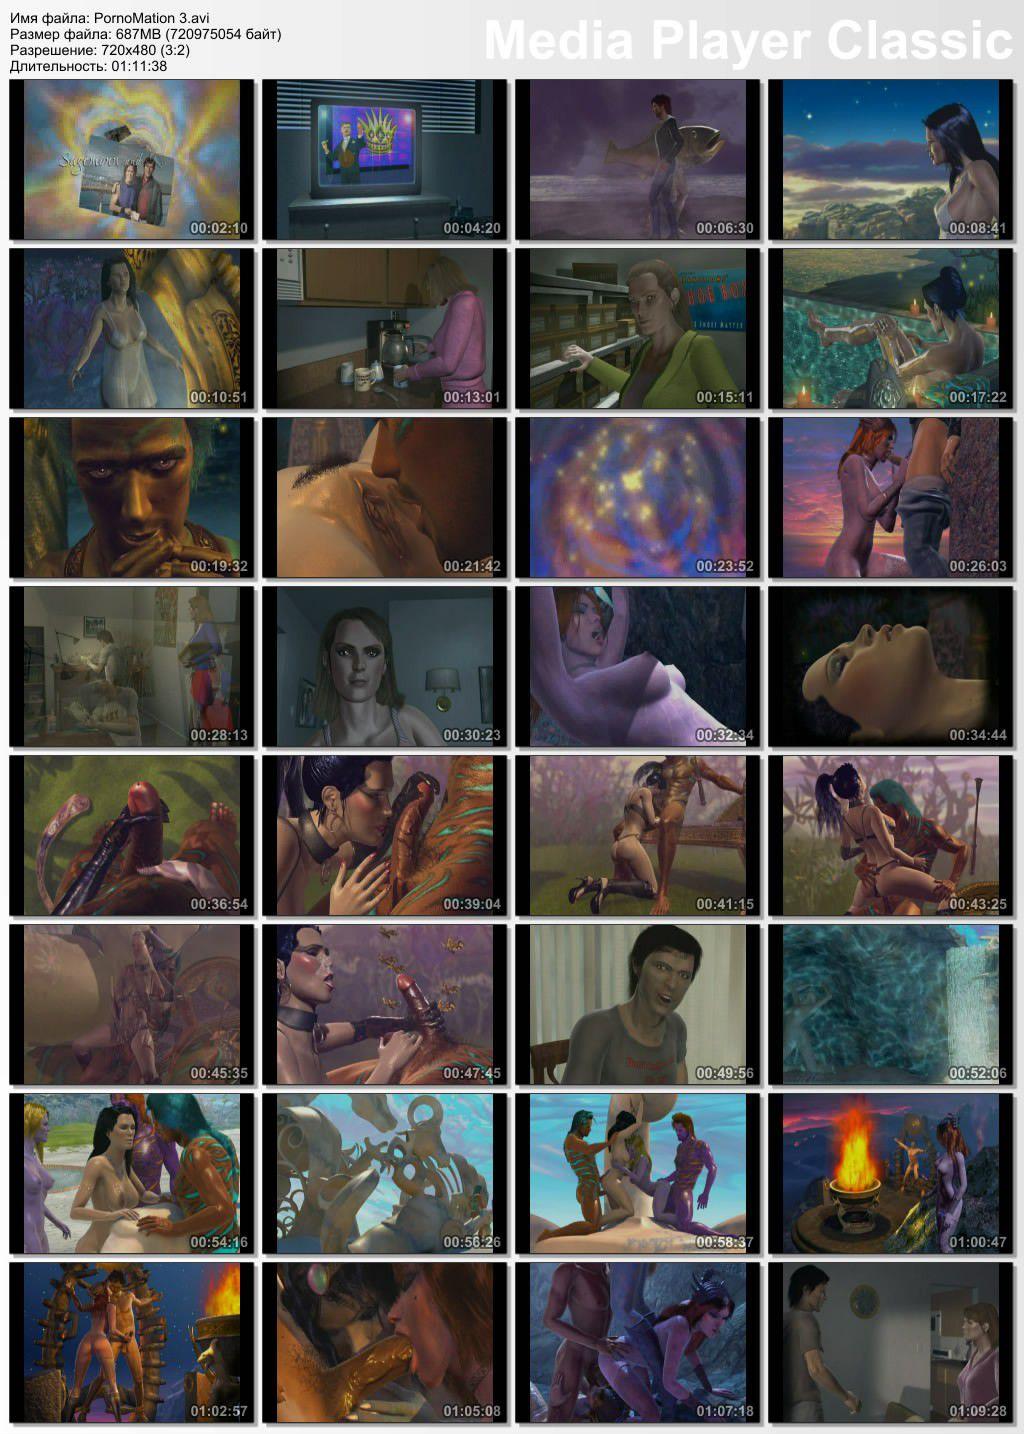 PornoMation 3. Dream Spells - The Daimons Within / Порномация 3. Периоды мечты - Одержимые демонами [Ep.1] [ENG] Adult Animation